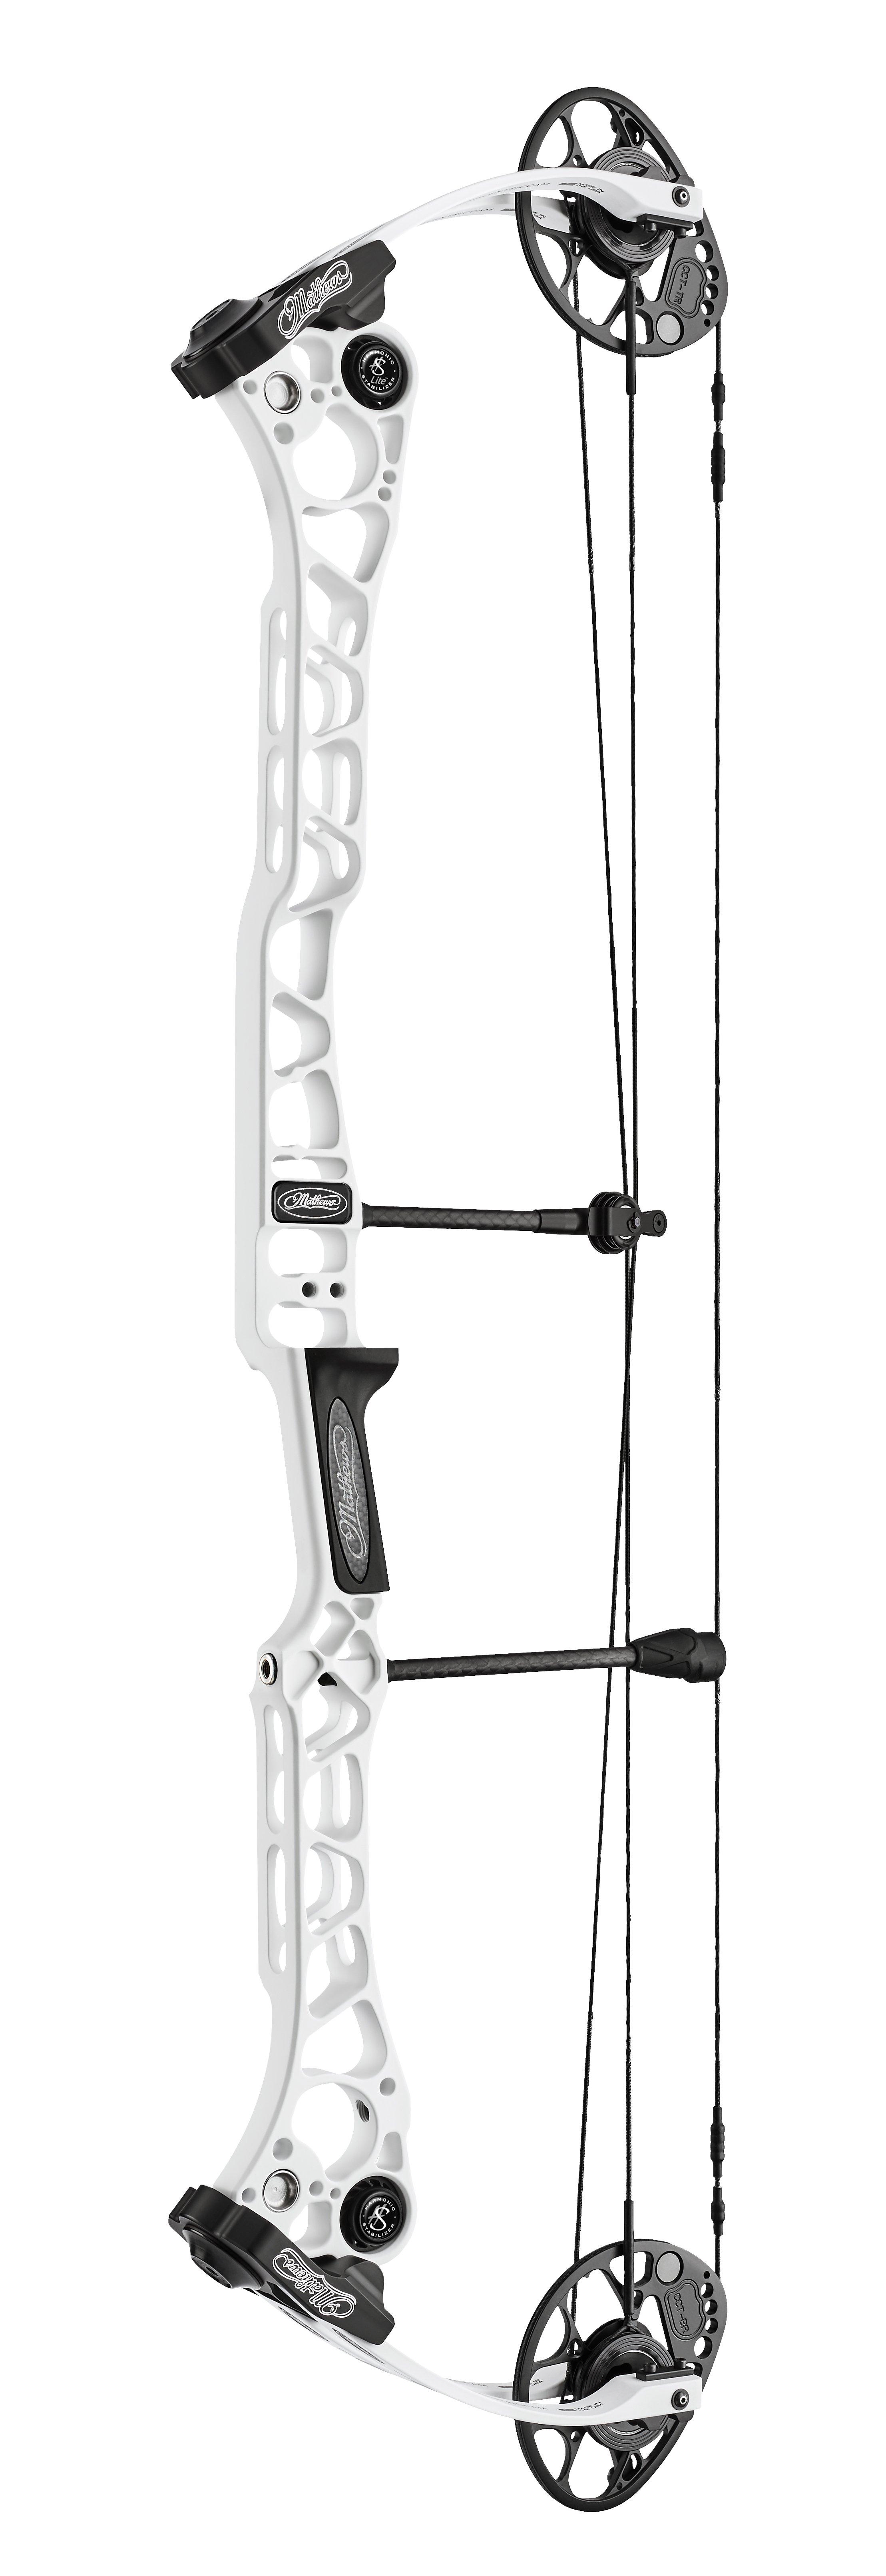 Mathews TRX 38 Compoundbogen LH (special order) / White